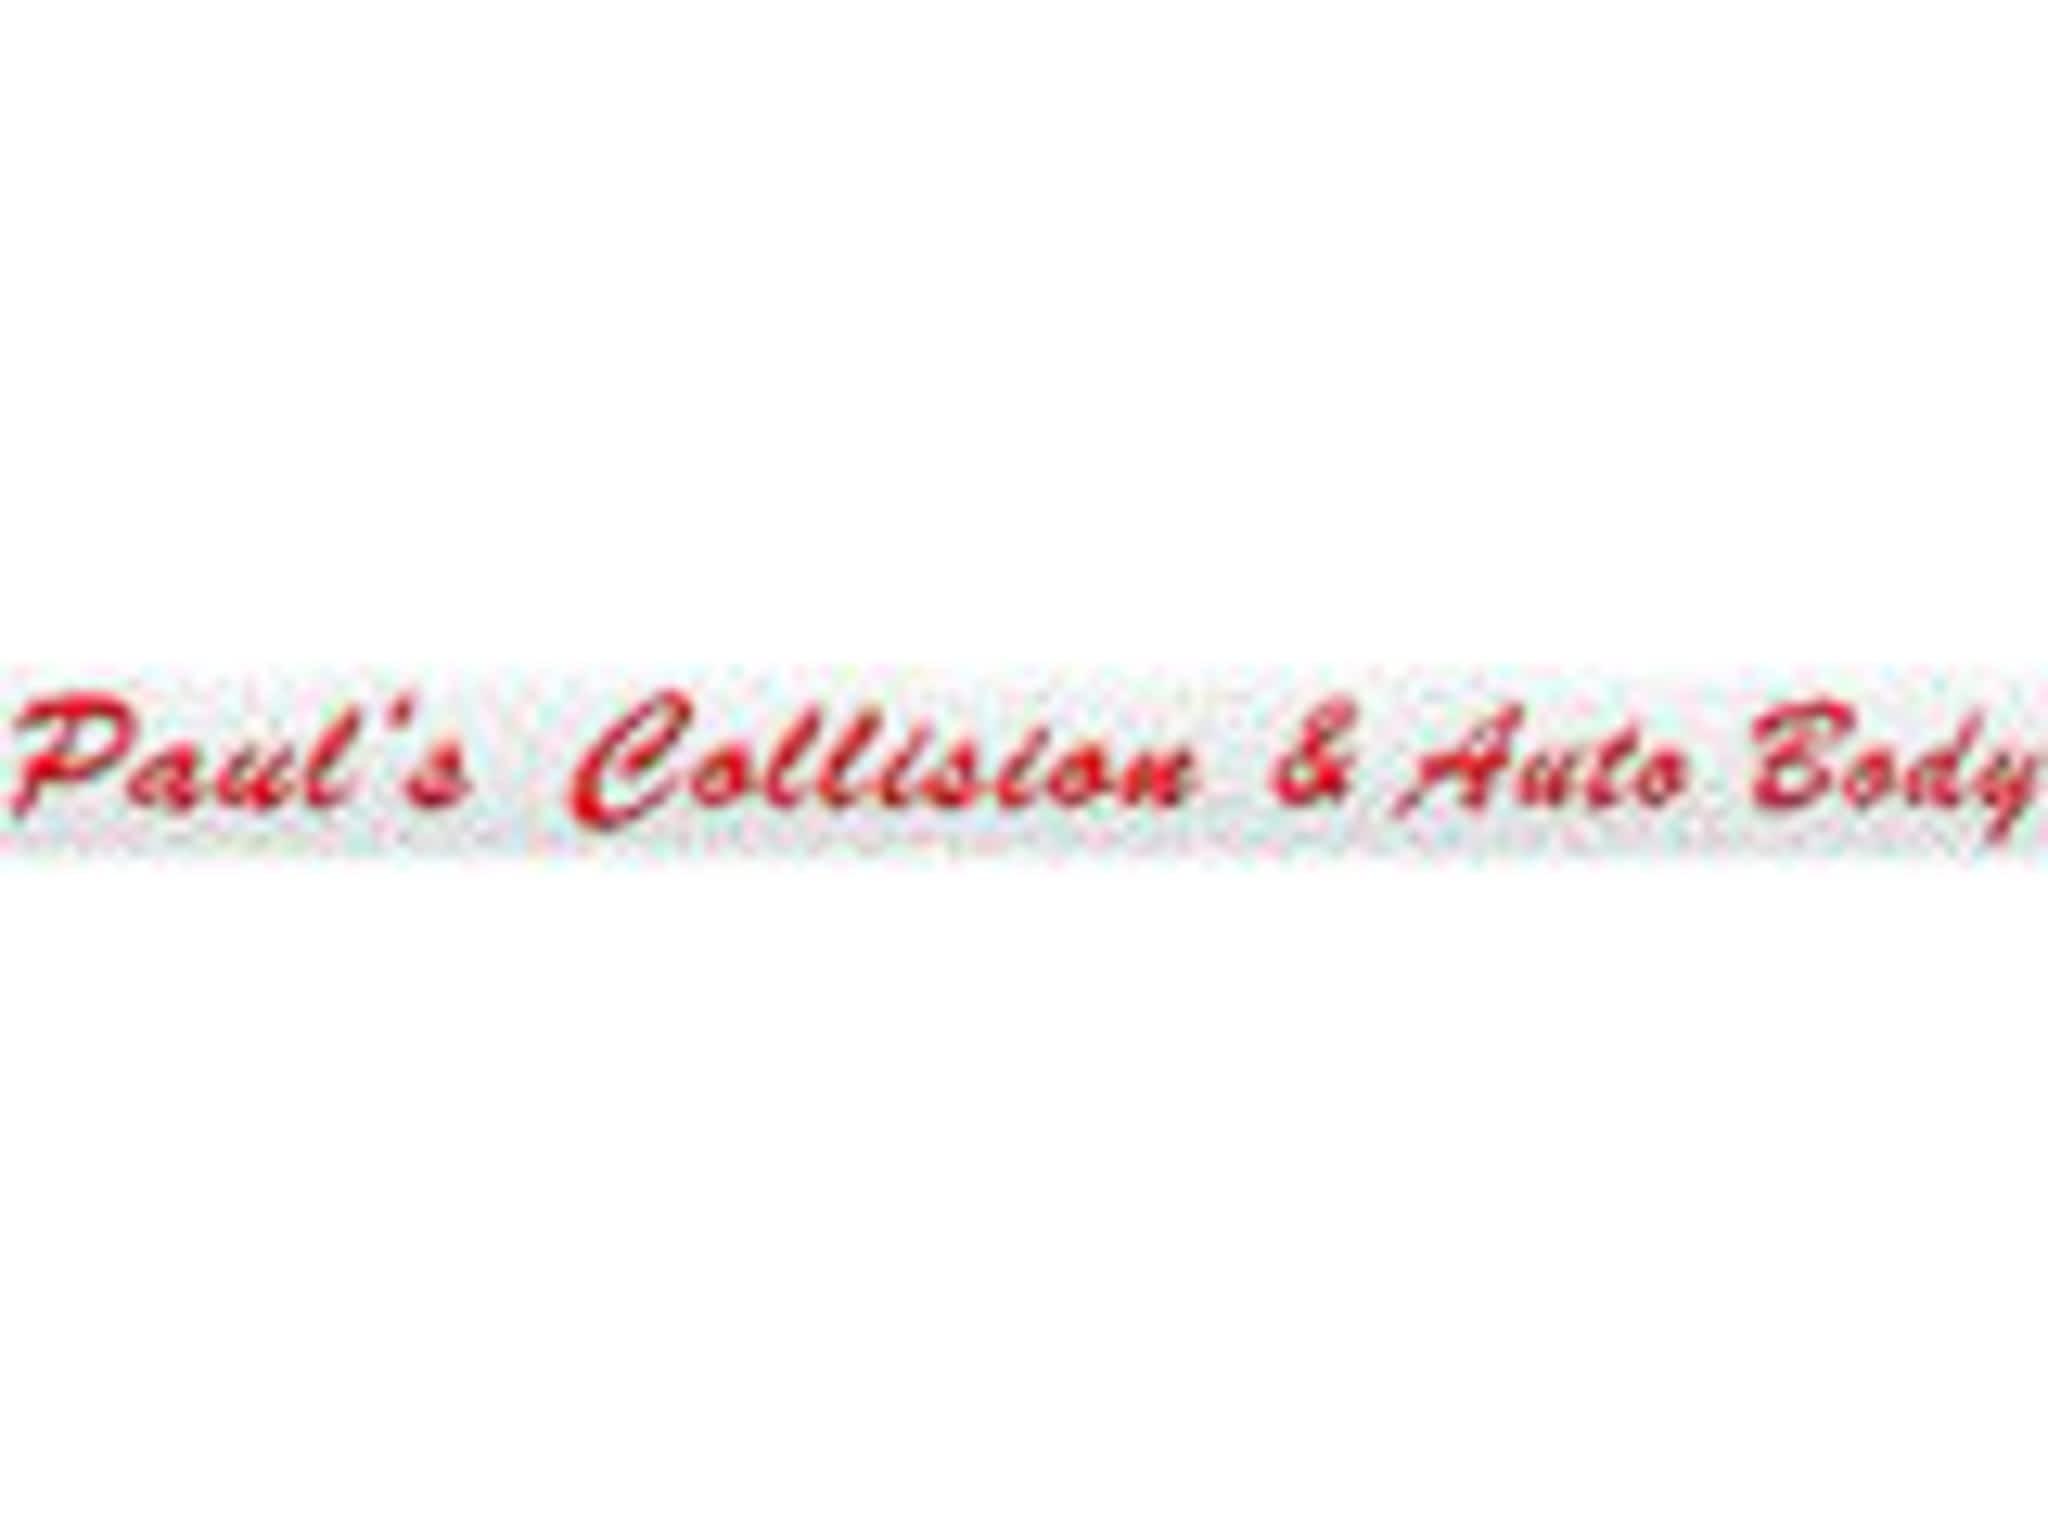 photo Paul's Collision & Auto Body